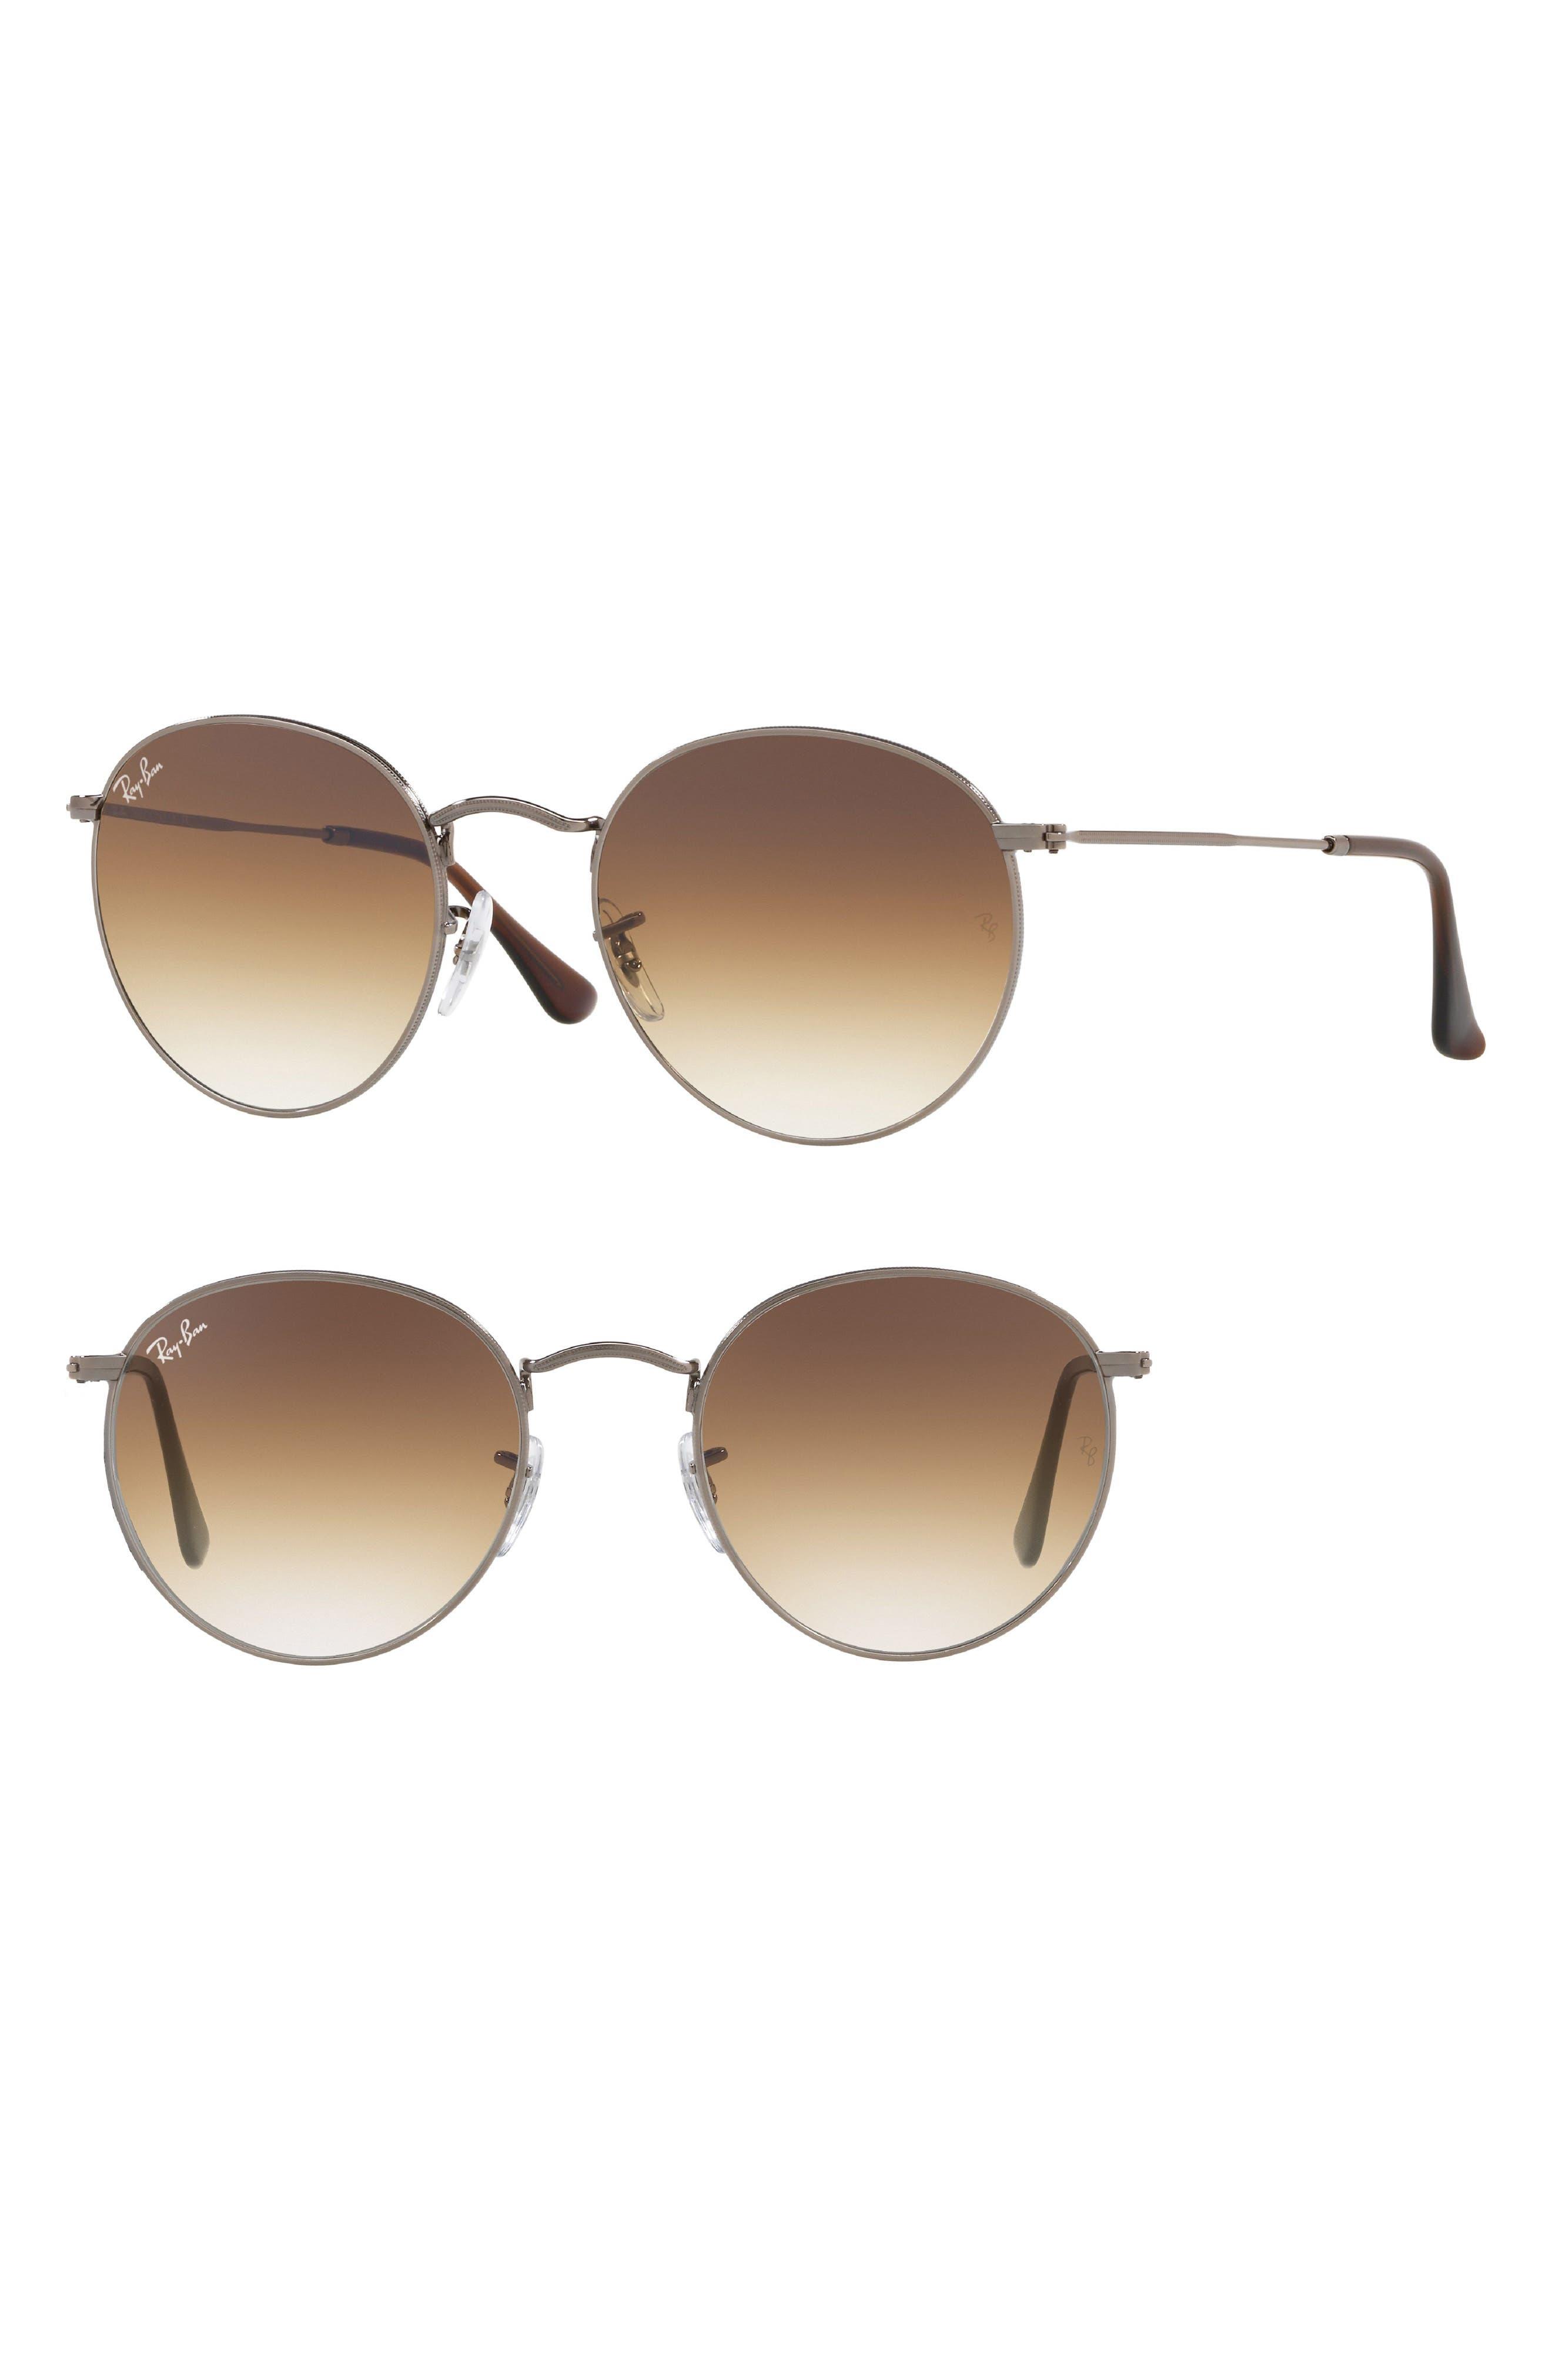 Phantos 50mm Gradient Sunglasses,                             Main thumbnail 1, color,                             GUNMETAL